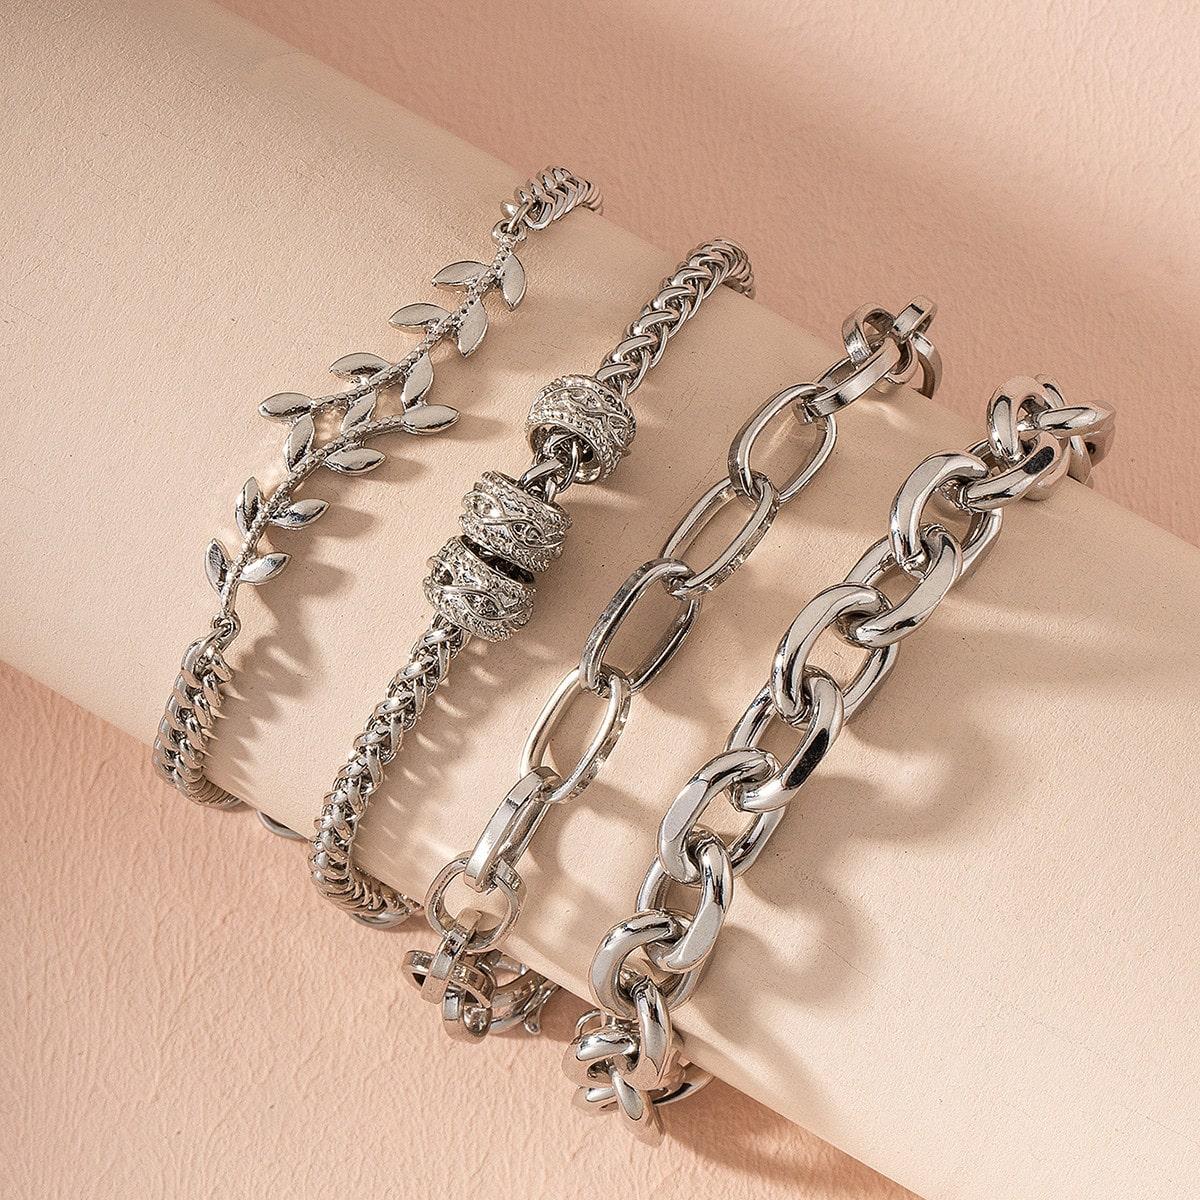 4 Stücke Armband mit Blatt Design